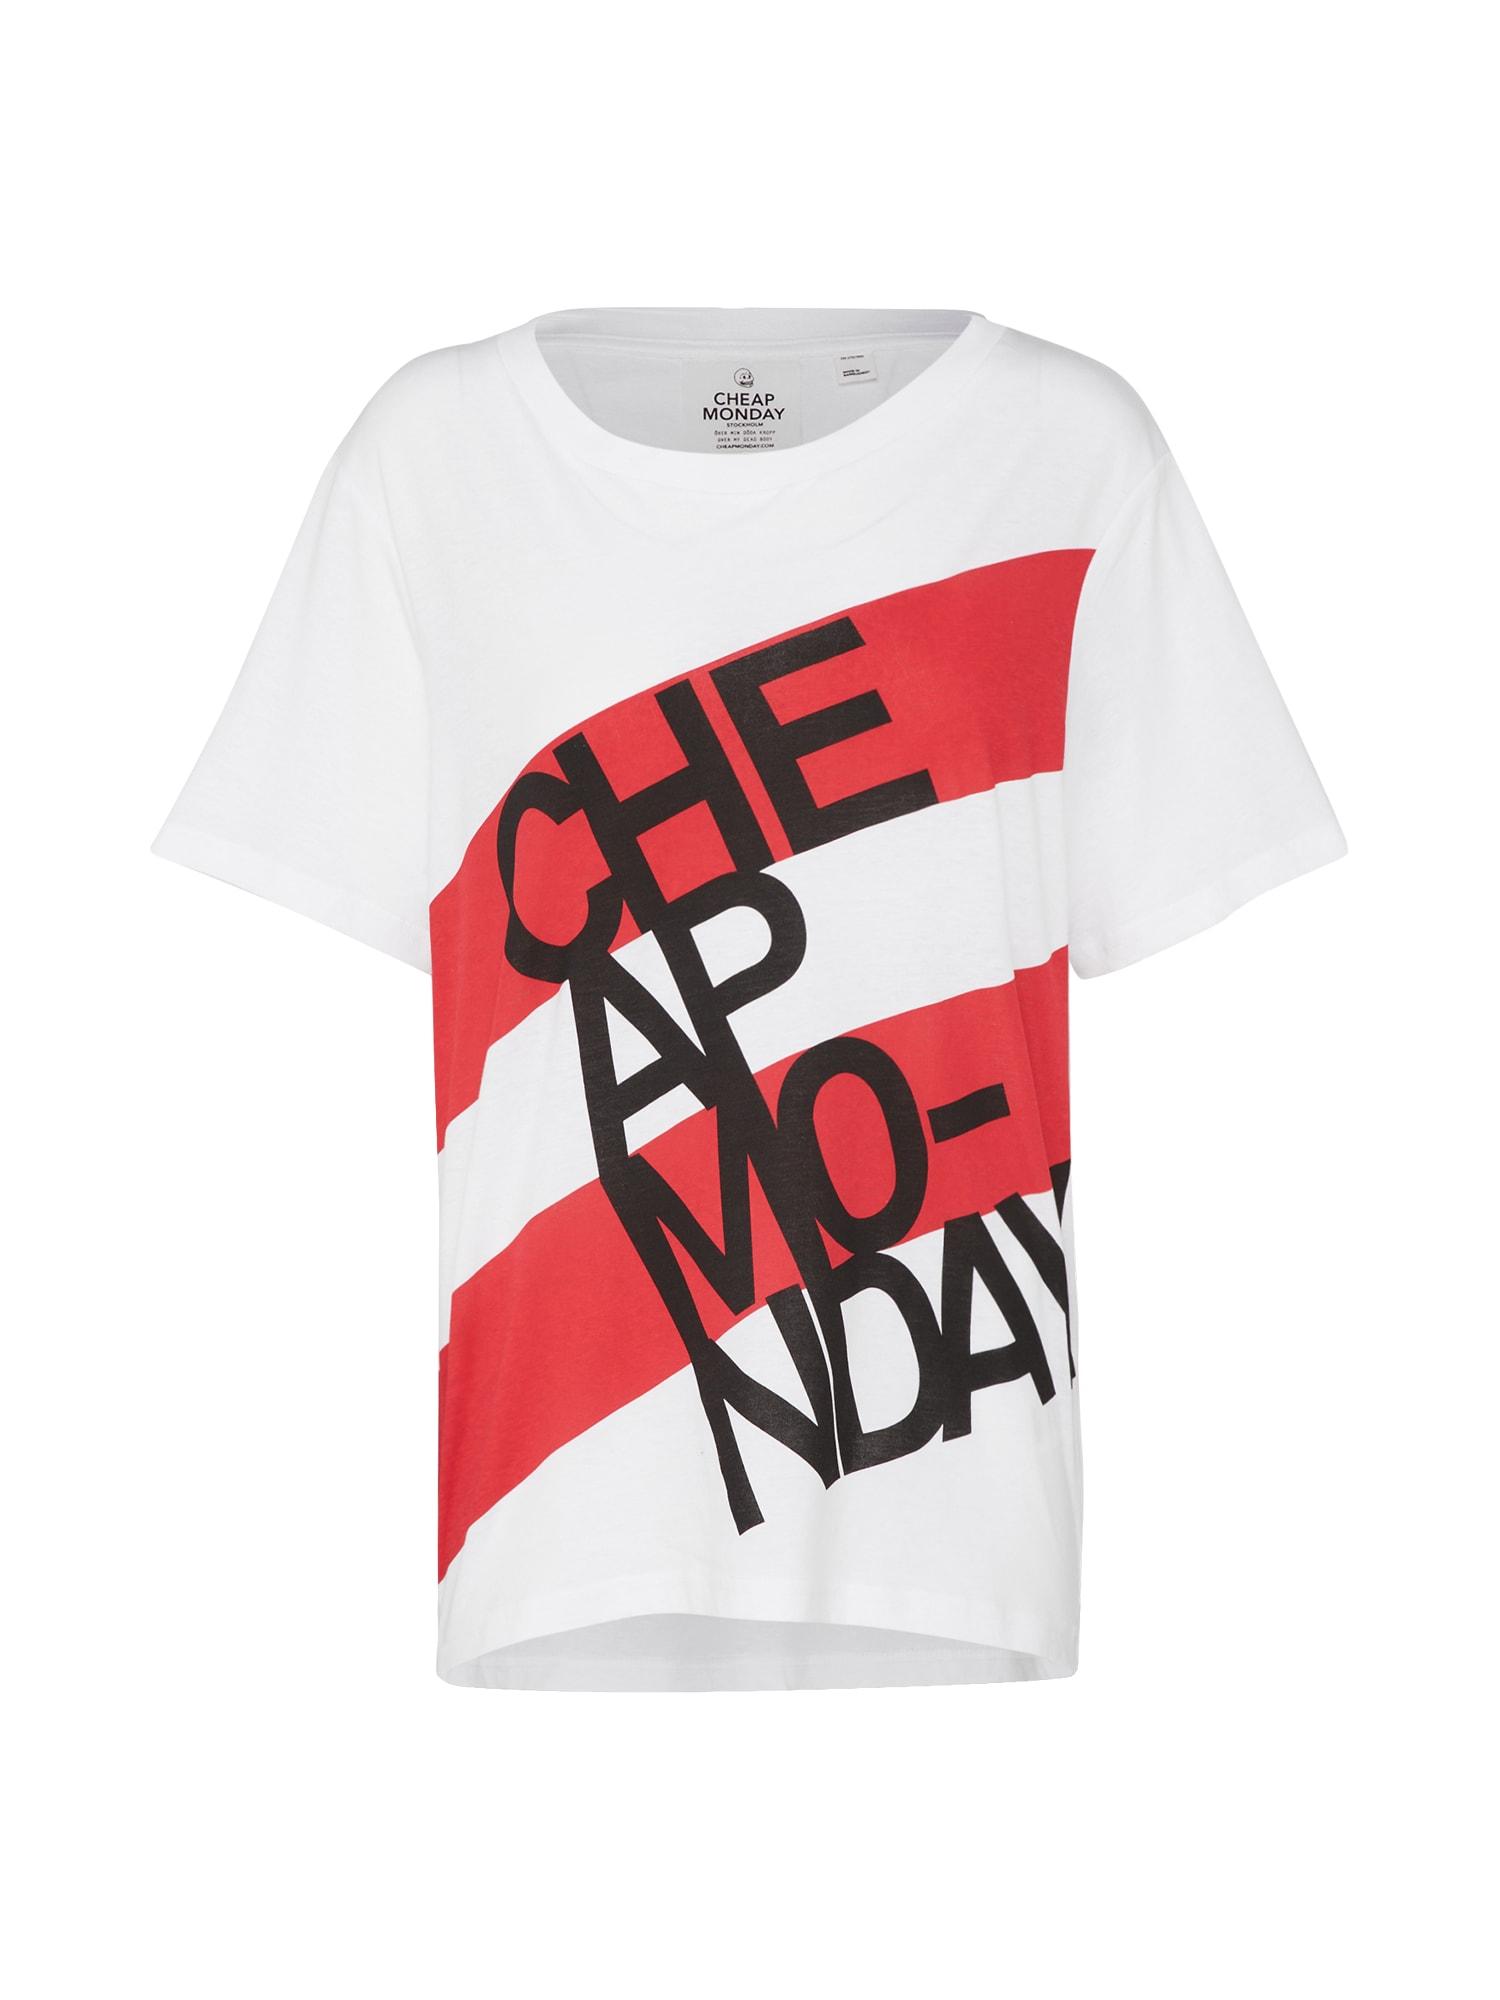 CHEAP MONDAY Dames Shirt Breeze rood wit